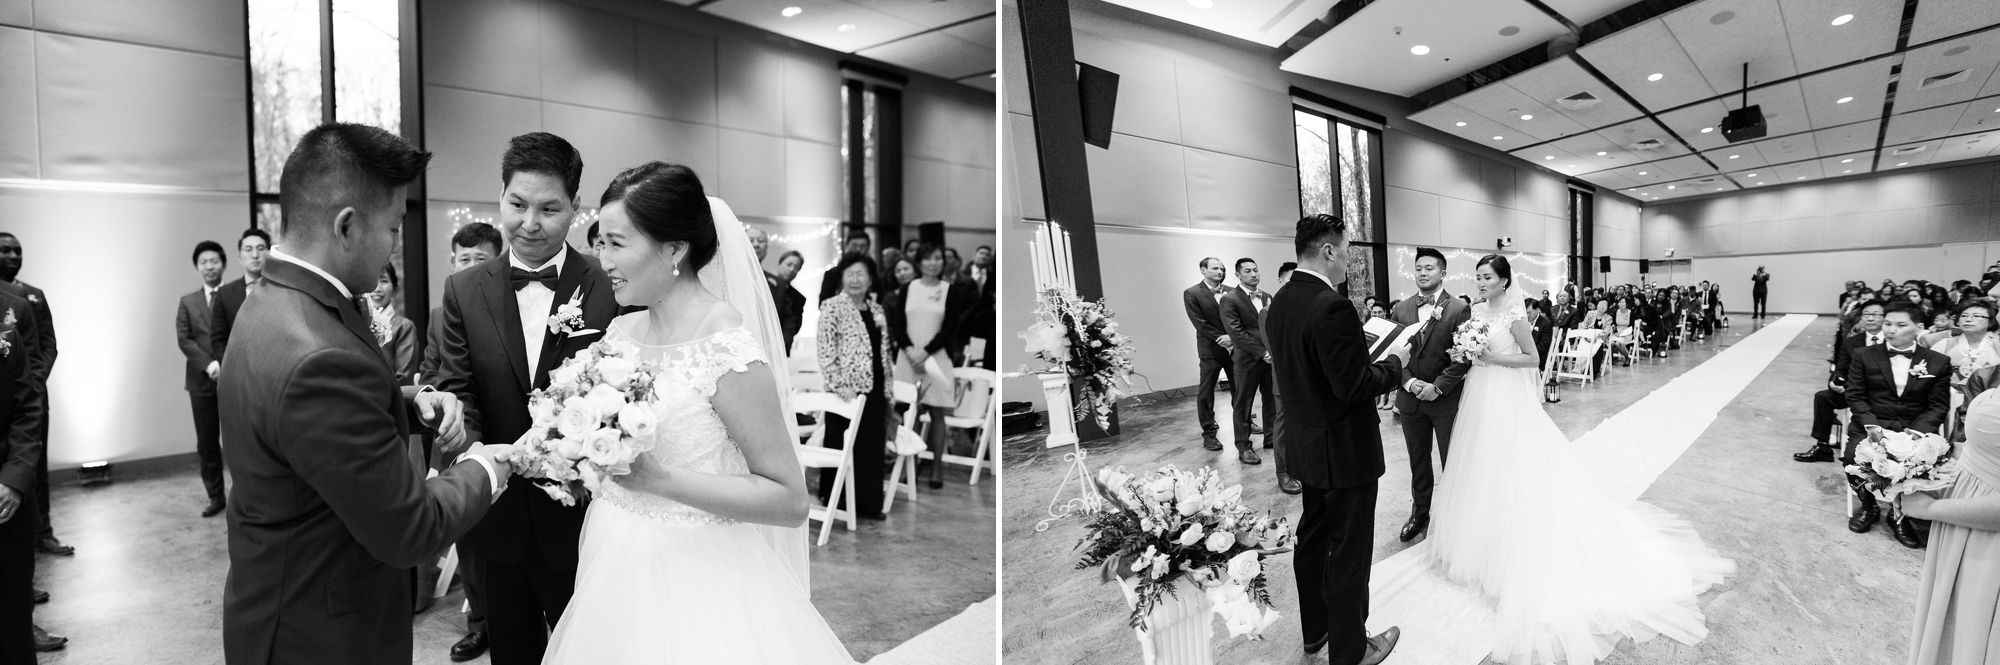 Wedding Blog 37.jpg